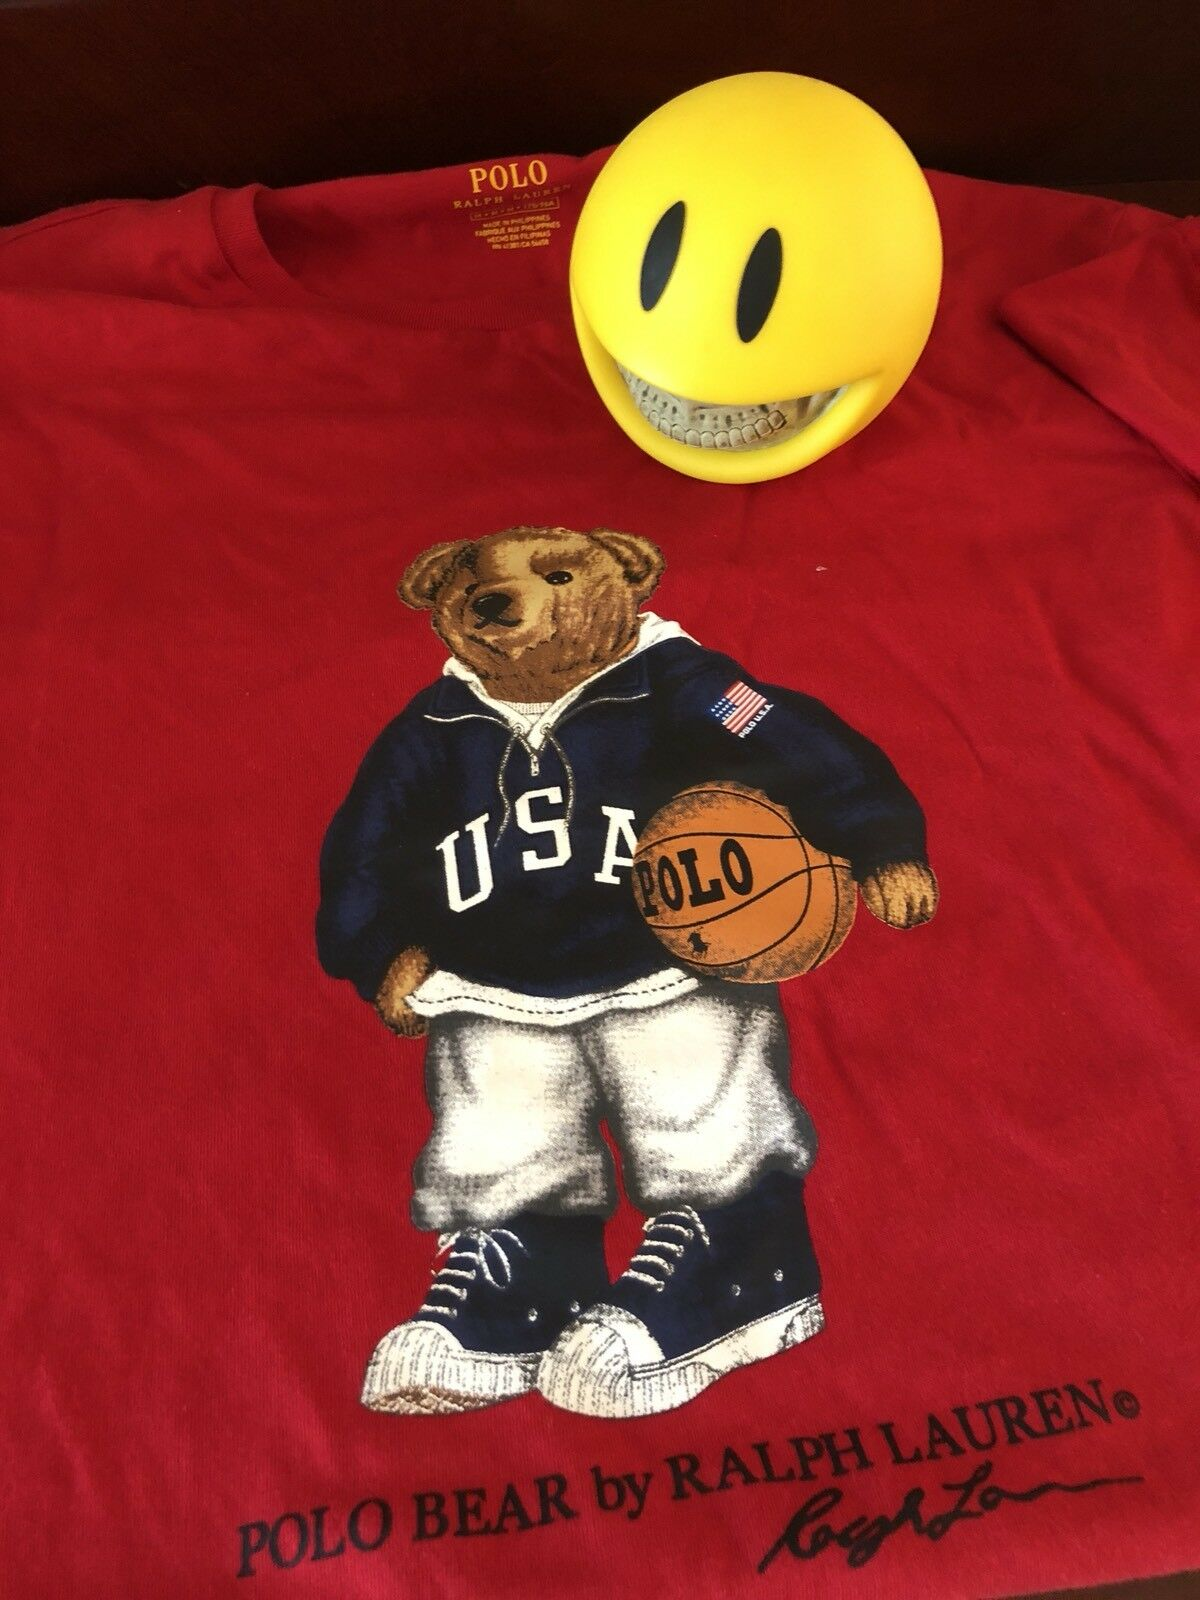 POLO RALPH LAUREN LIMITED EDITION RED BASKETBALL TEDDY BEAR TEE SIZE M NWT POLO